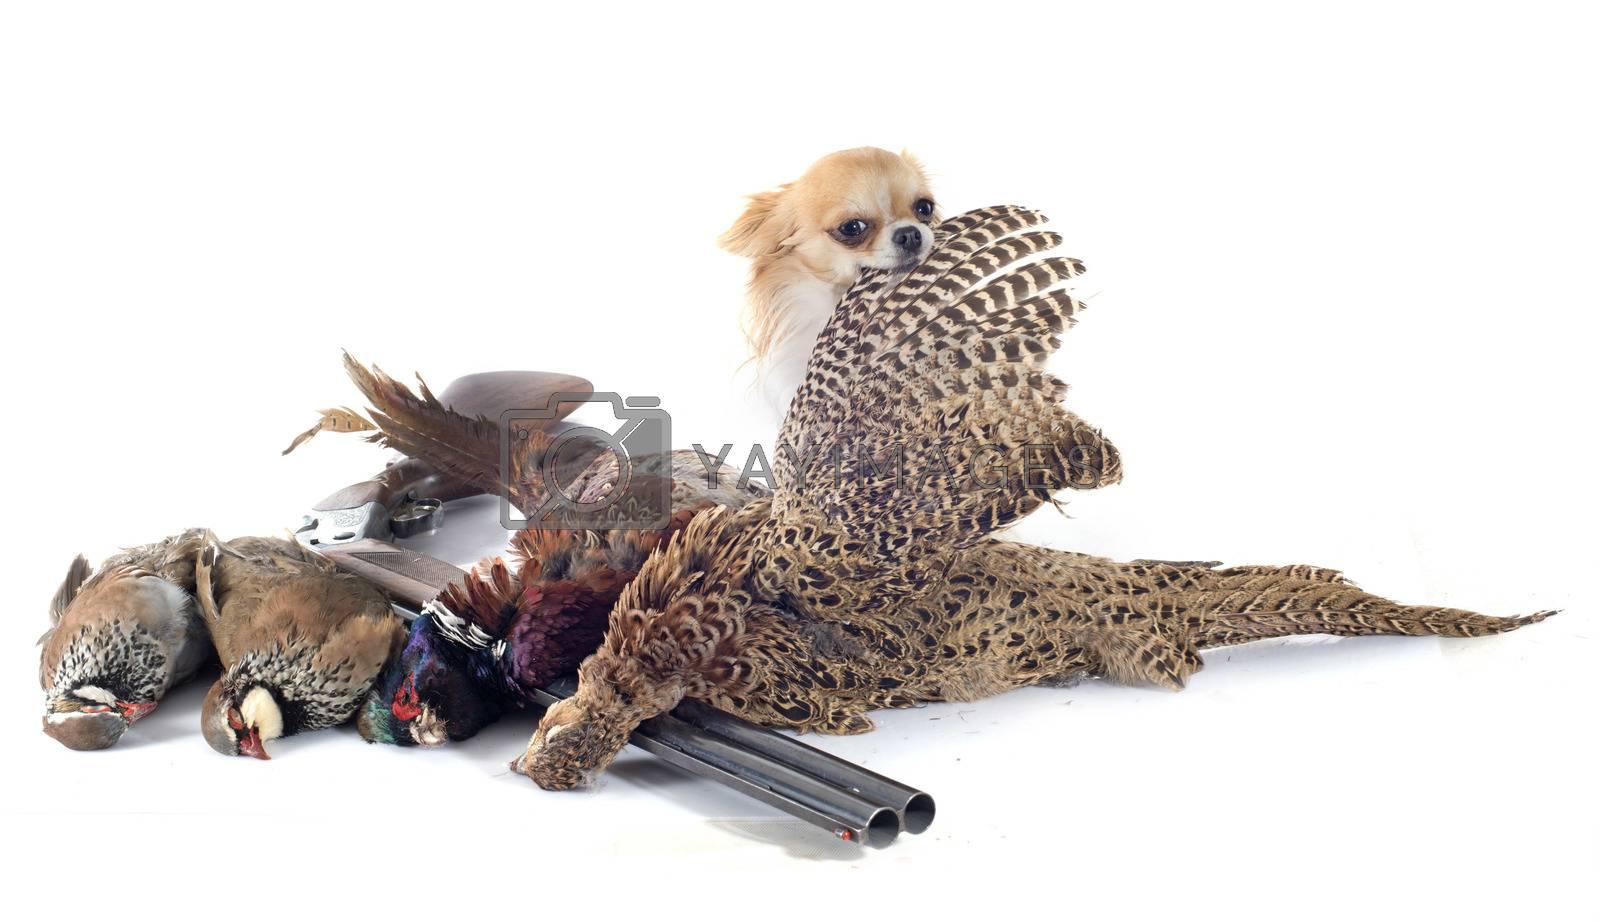 Royalty free image of hunting dog by cynoclub